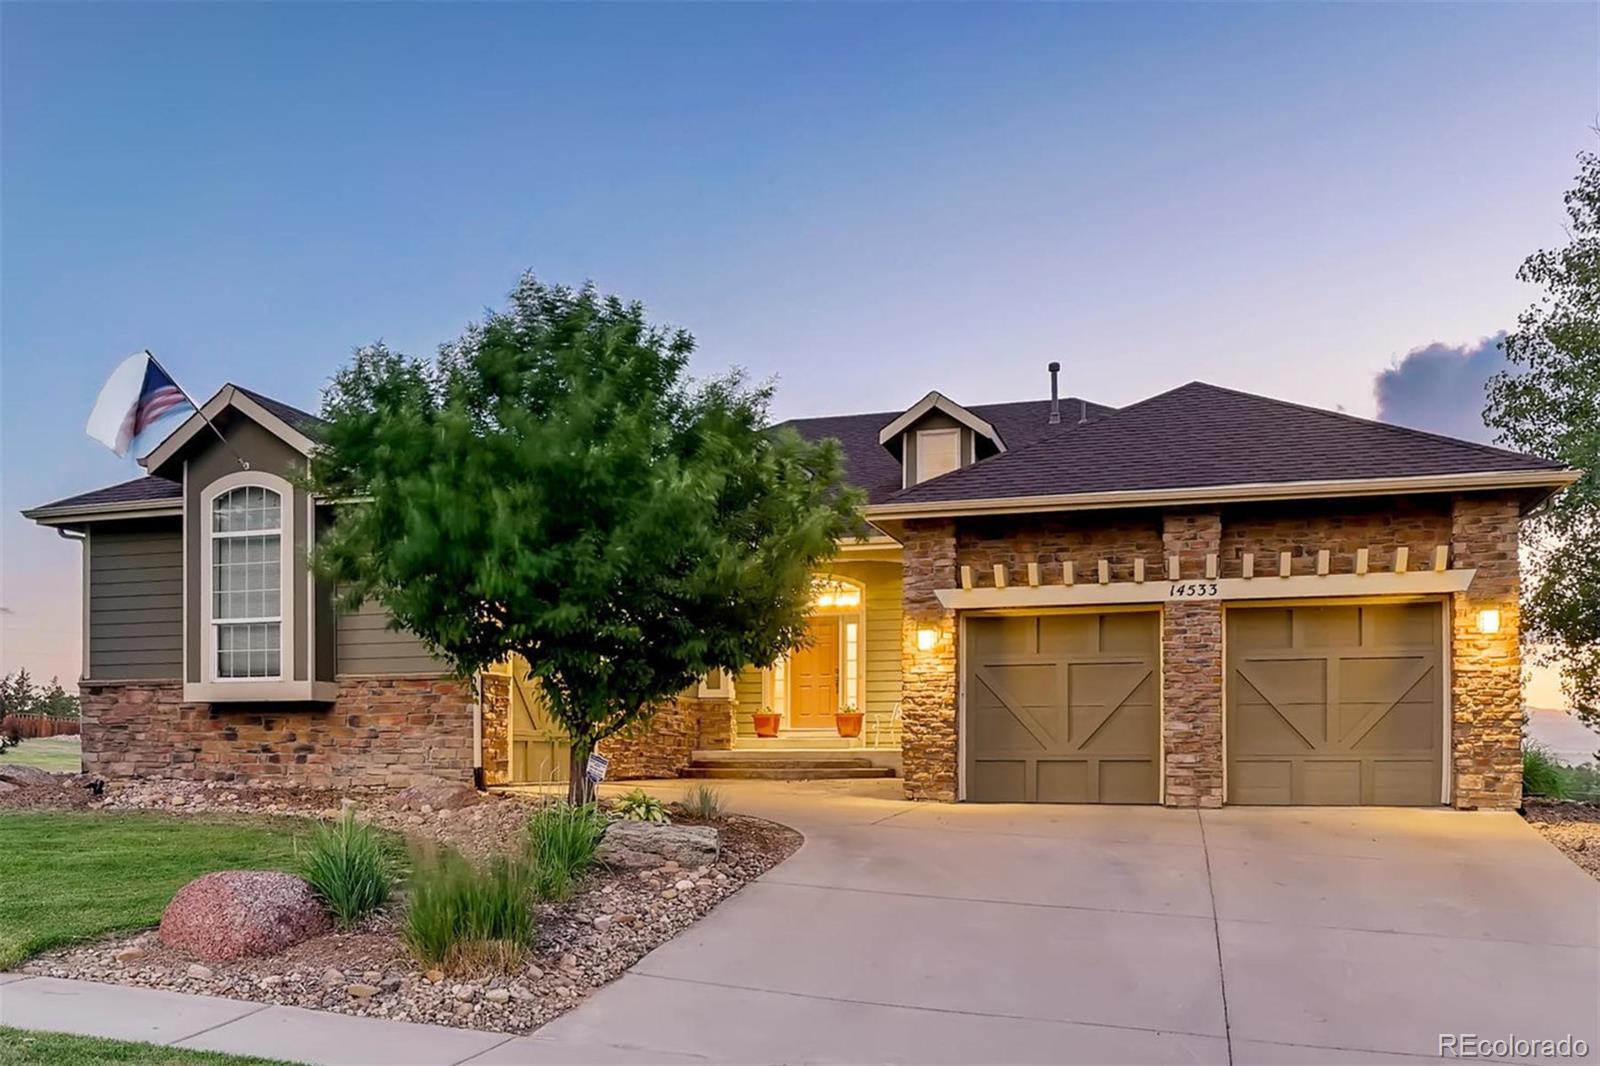 14533 Stargazer Drive Property Photo - Broomfield, CO real estate listing